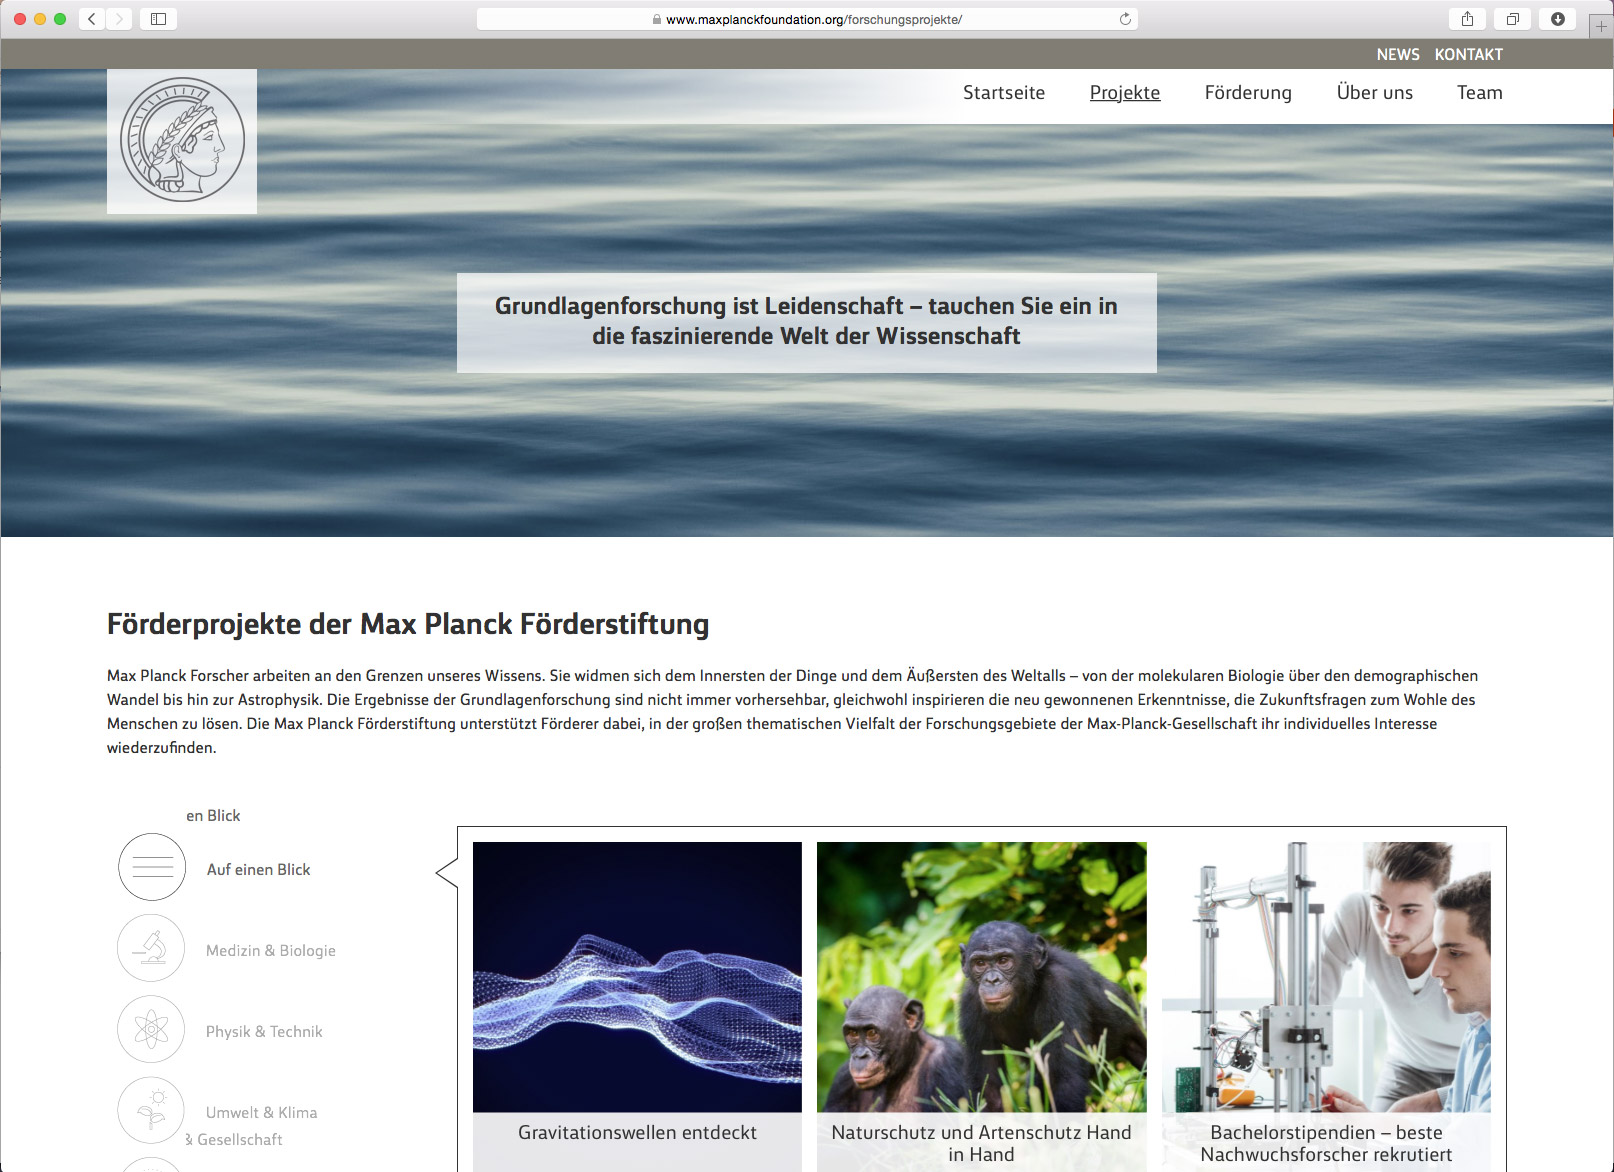 Max Planck Foundation